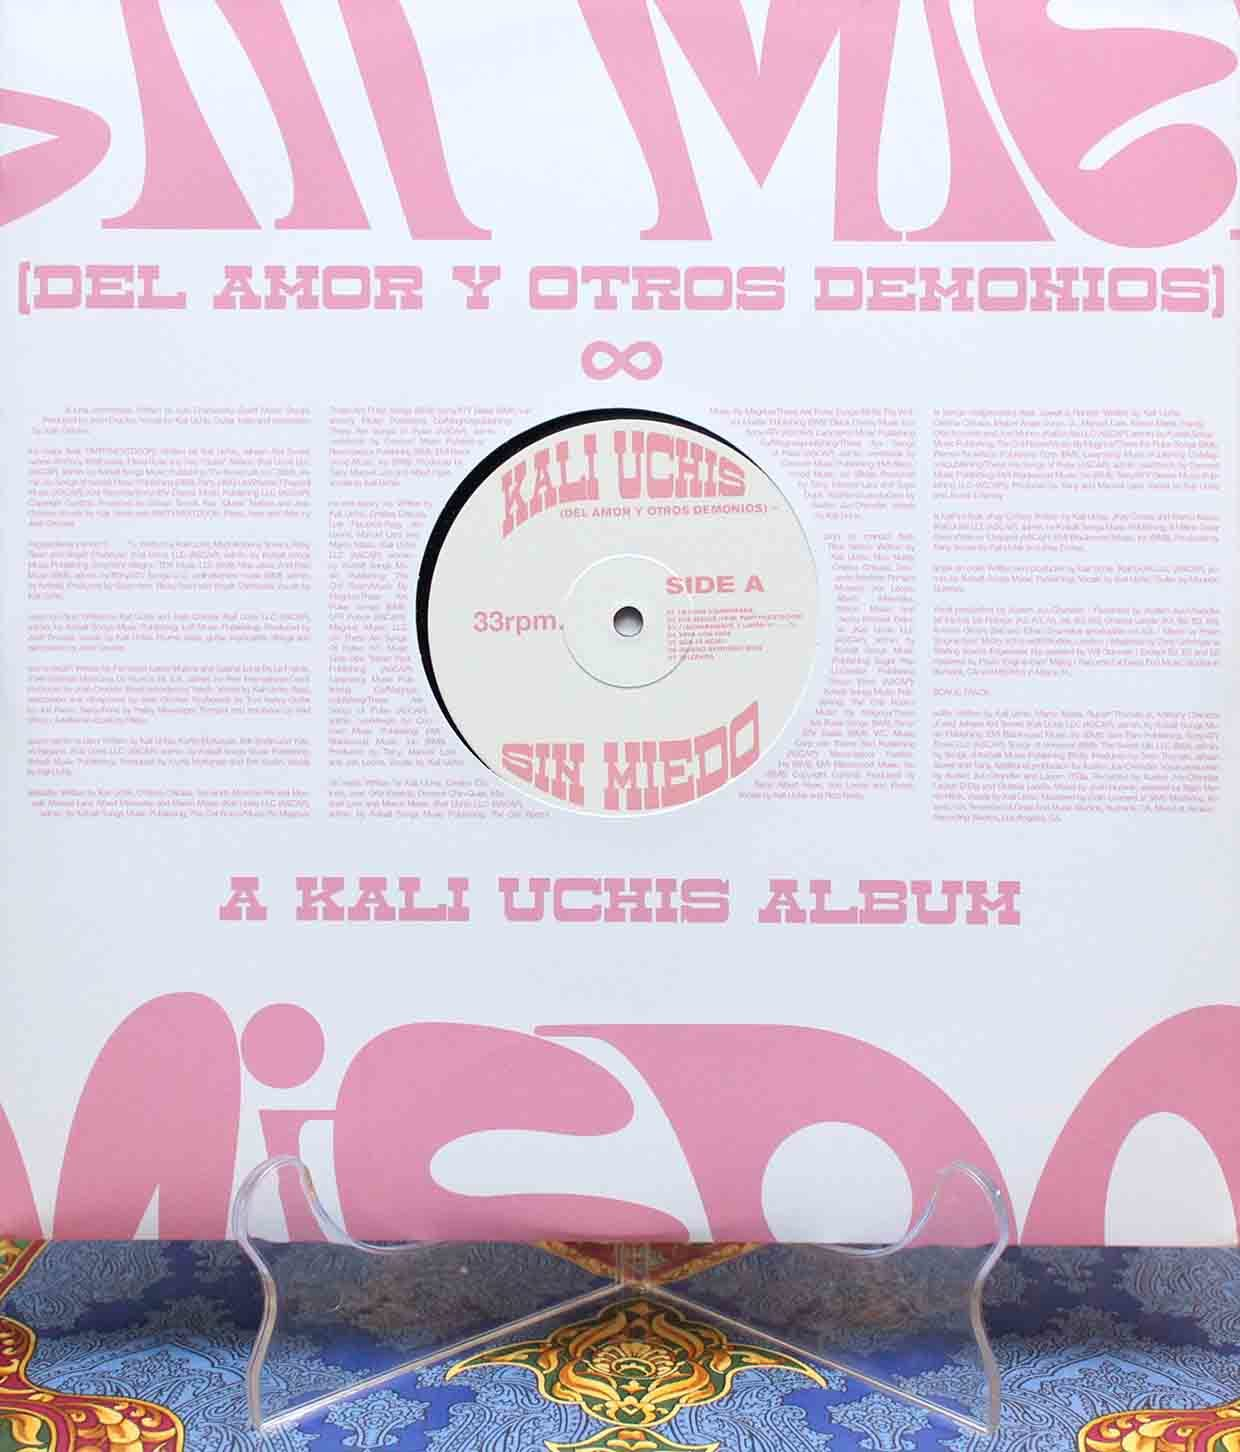 Kali Uchis - Sin Miedo 03